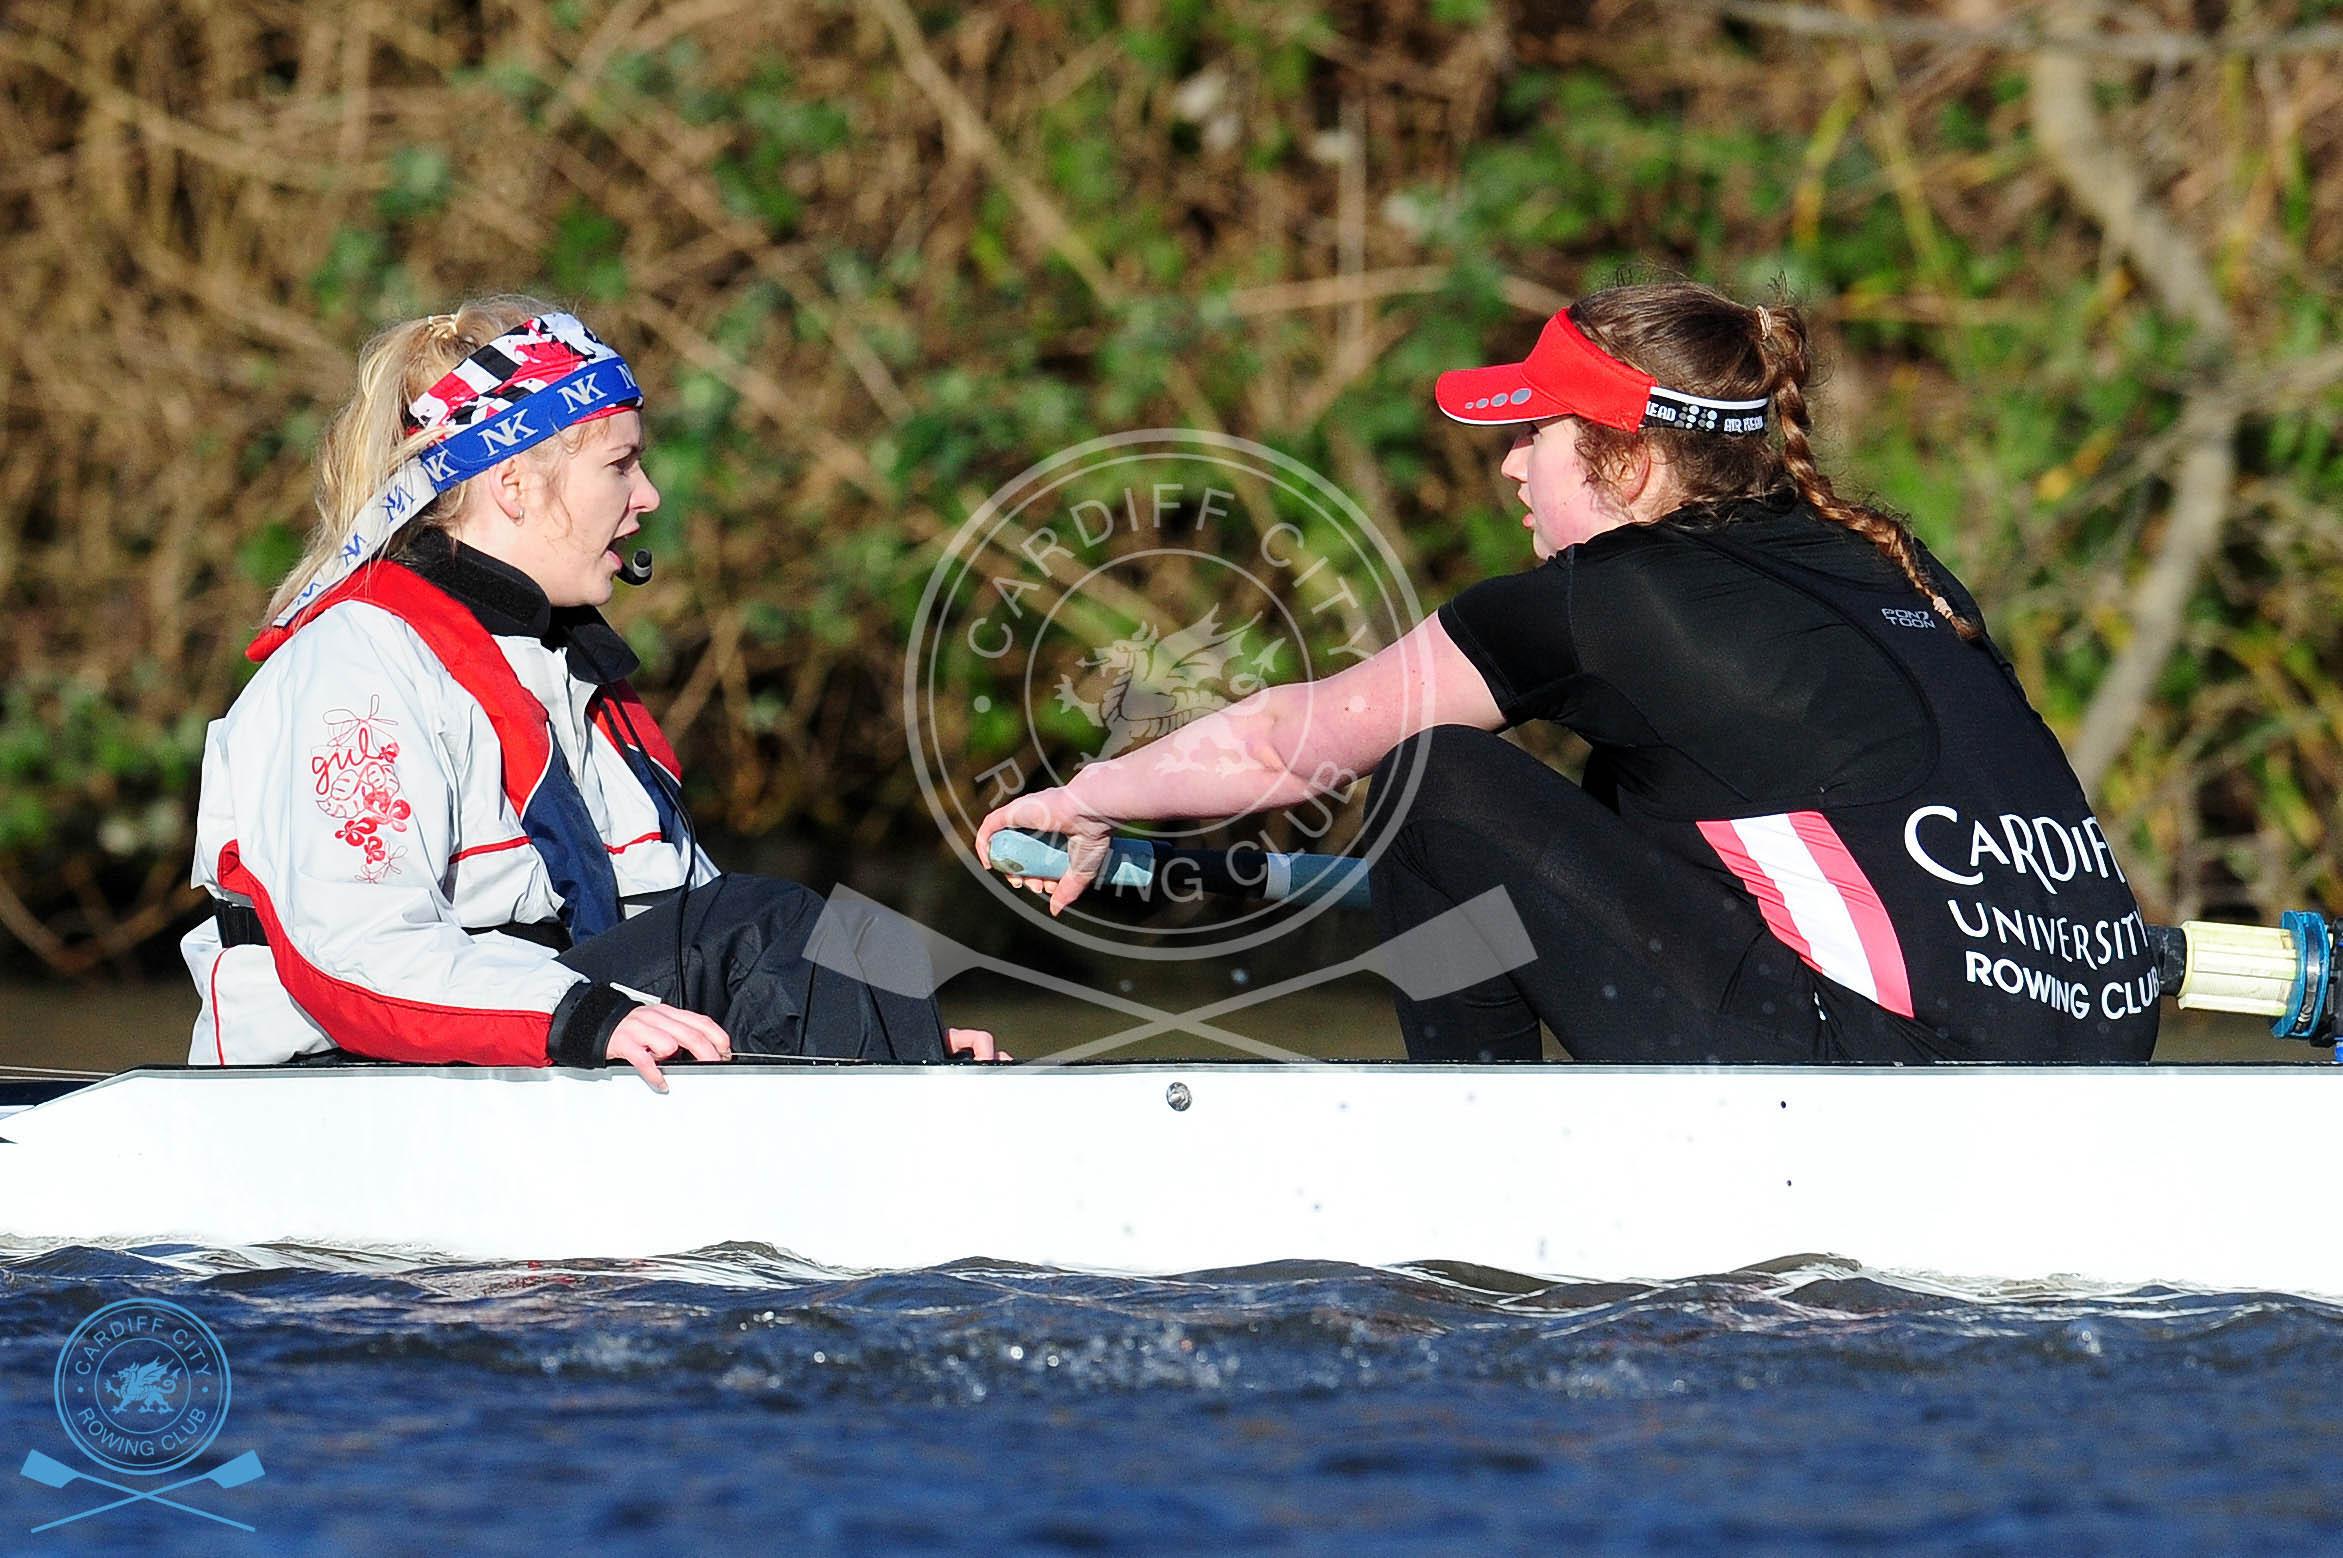 DW_280119_Cardiff_City_Rowing_246.jpg